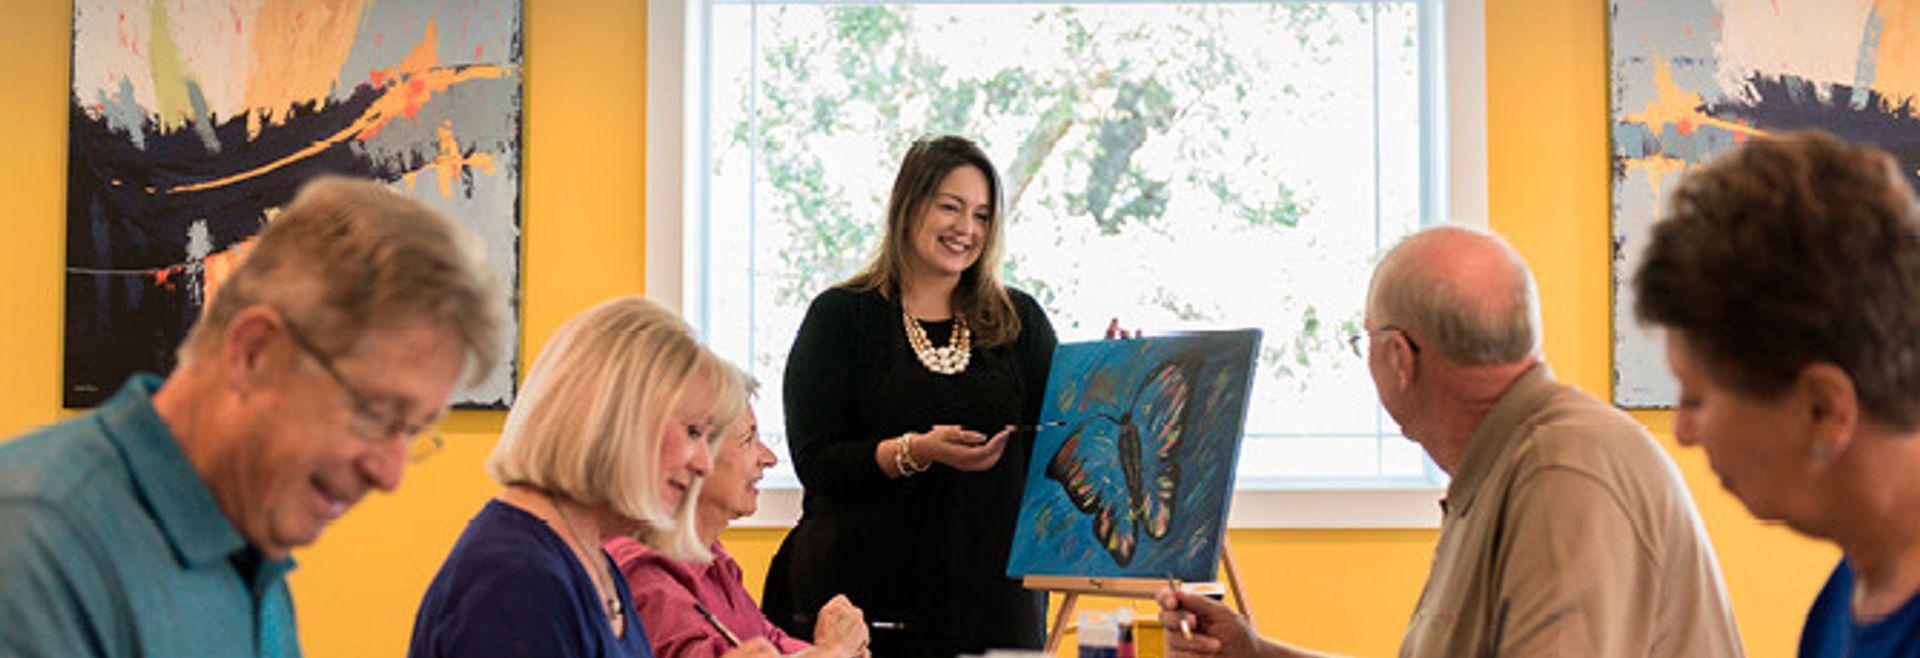 Trilogy at Ocala Preserve Art Studio